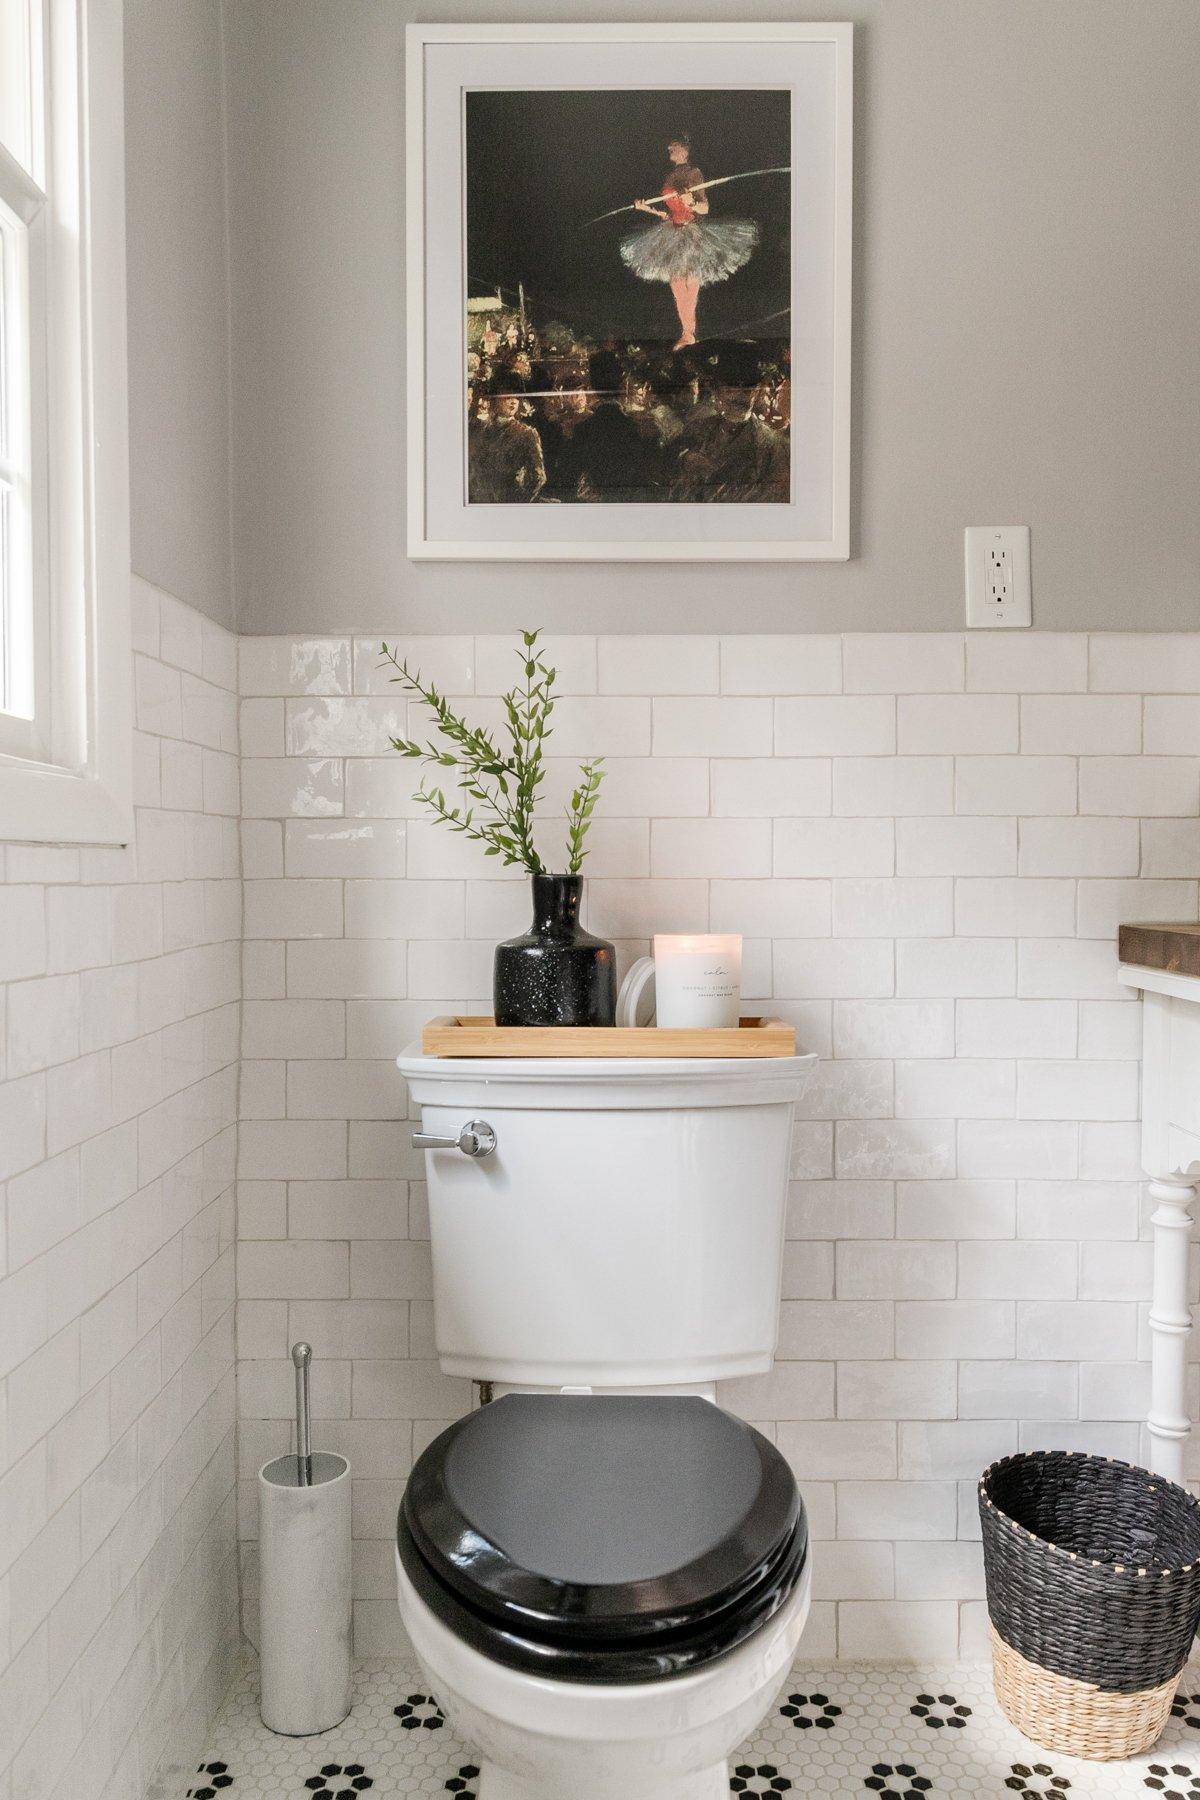 black toilet seat with classic bathroom decor